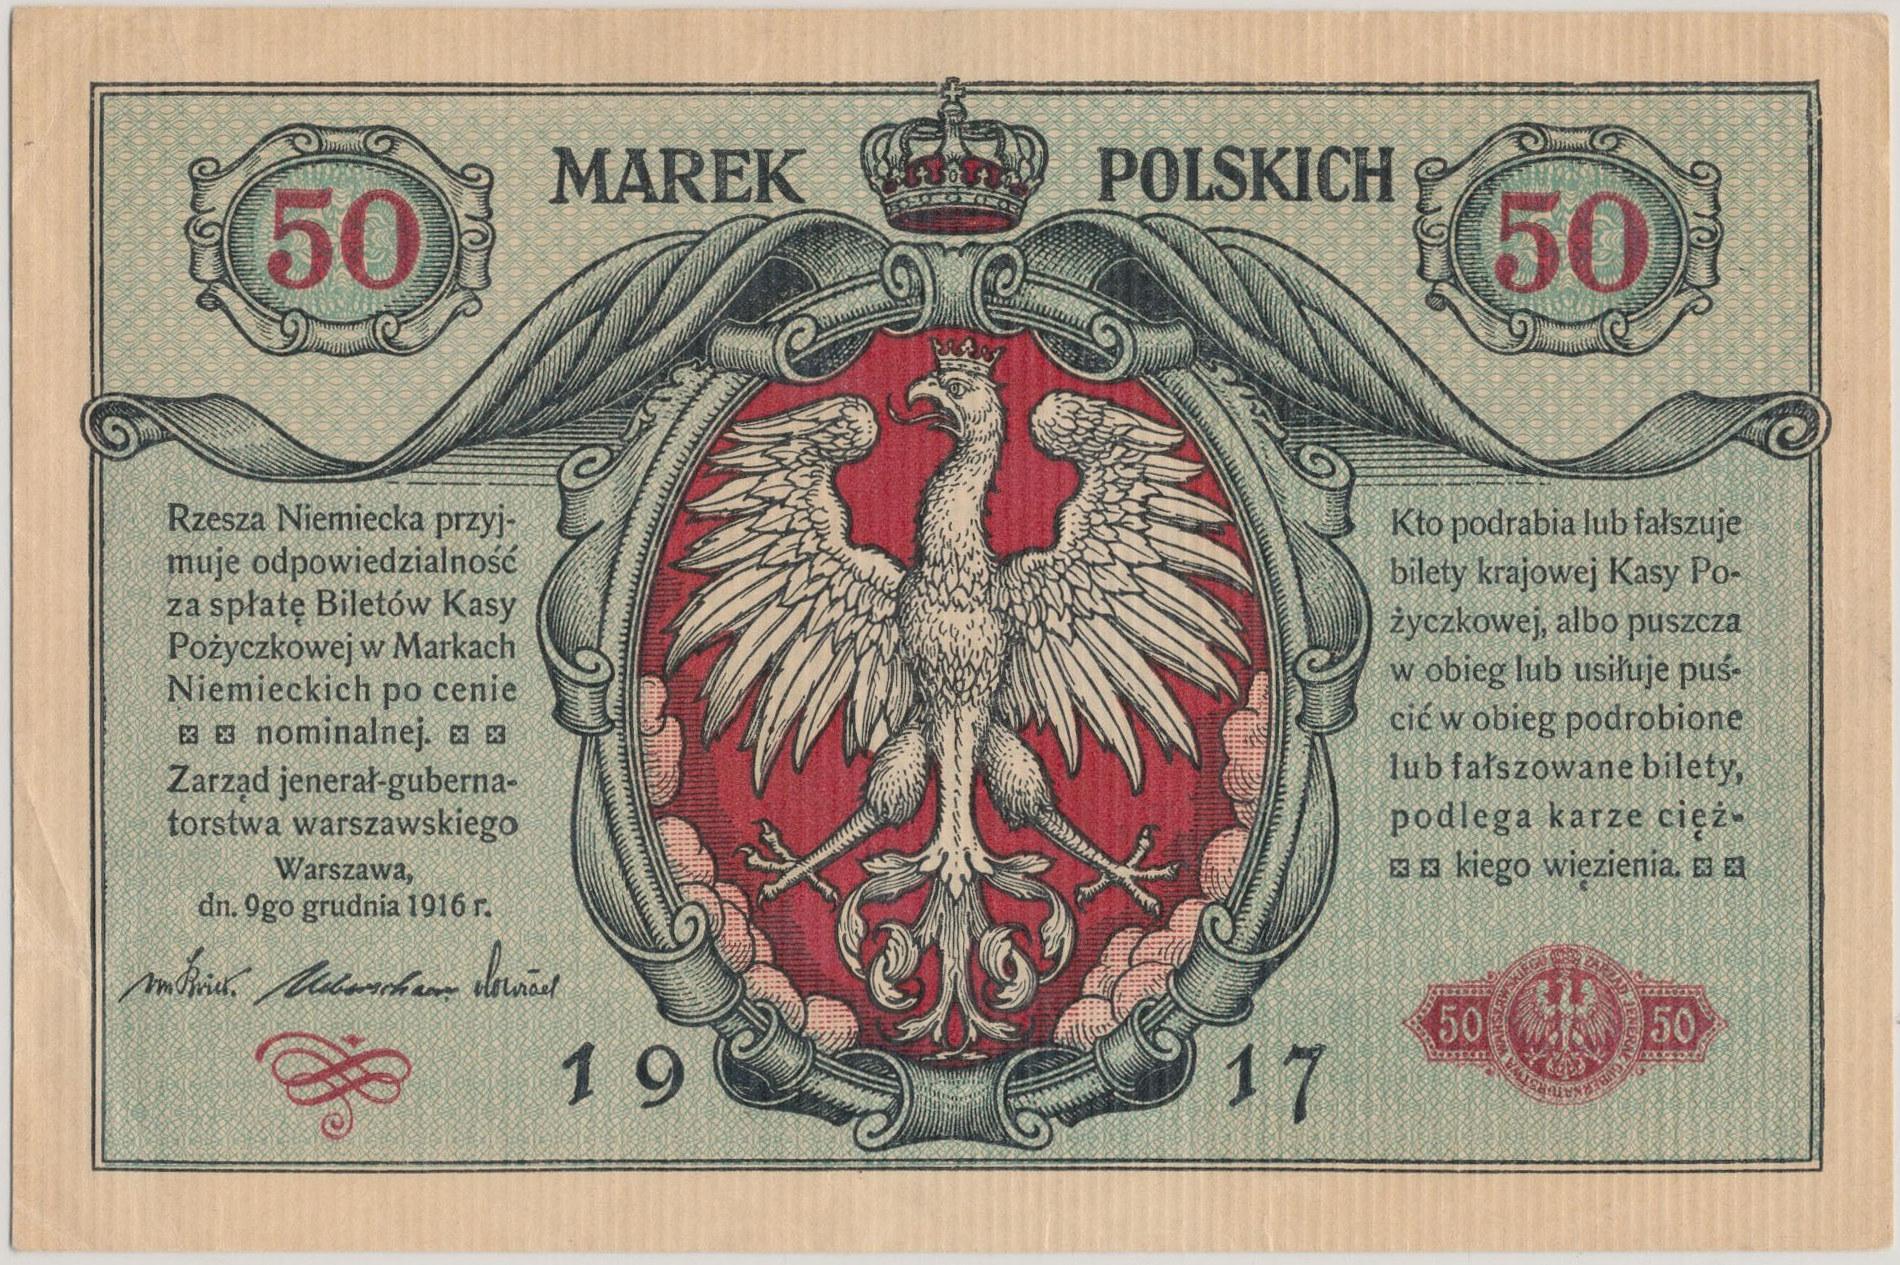 50_marek_polskich_1916_awers.jpg